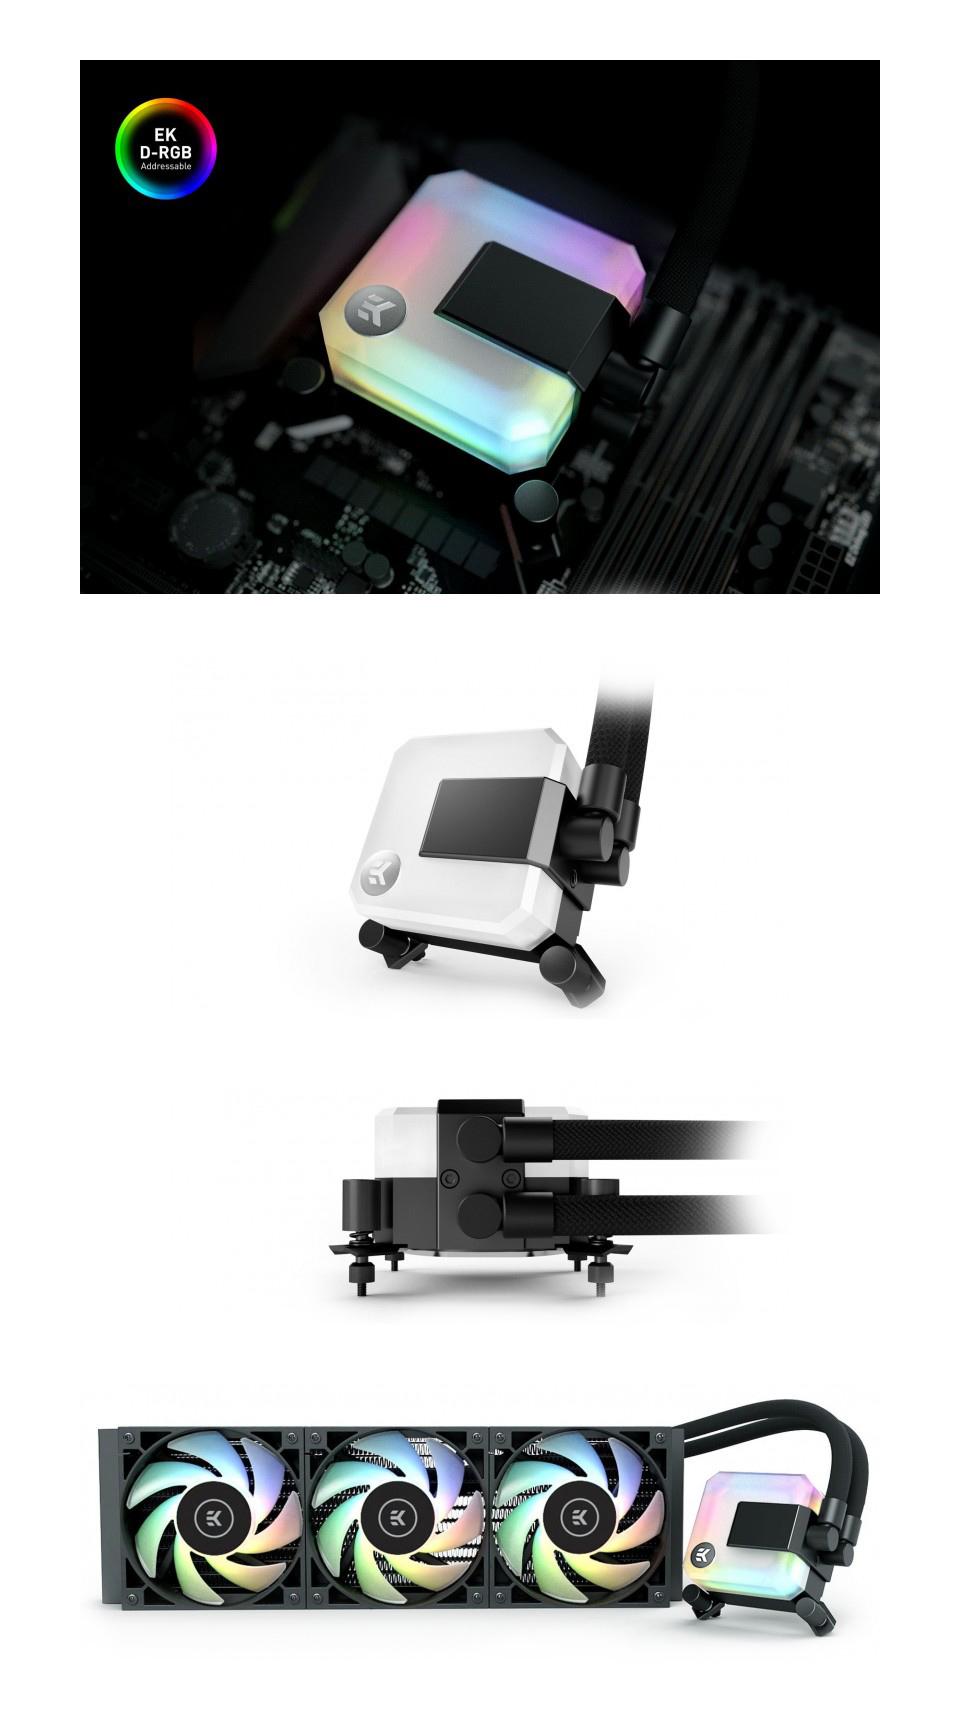 EK Waterblocks AIO Liquid CPU Cooler 360mm D-RGB product